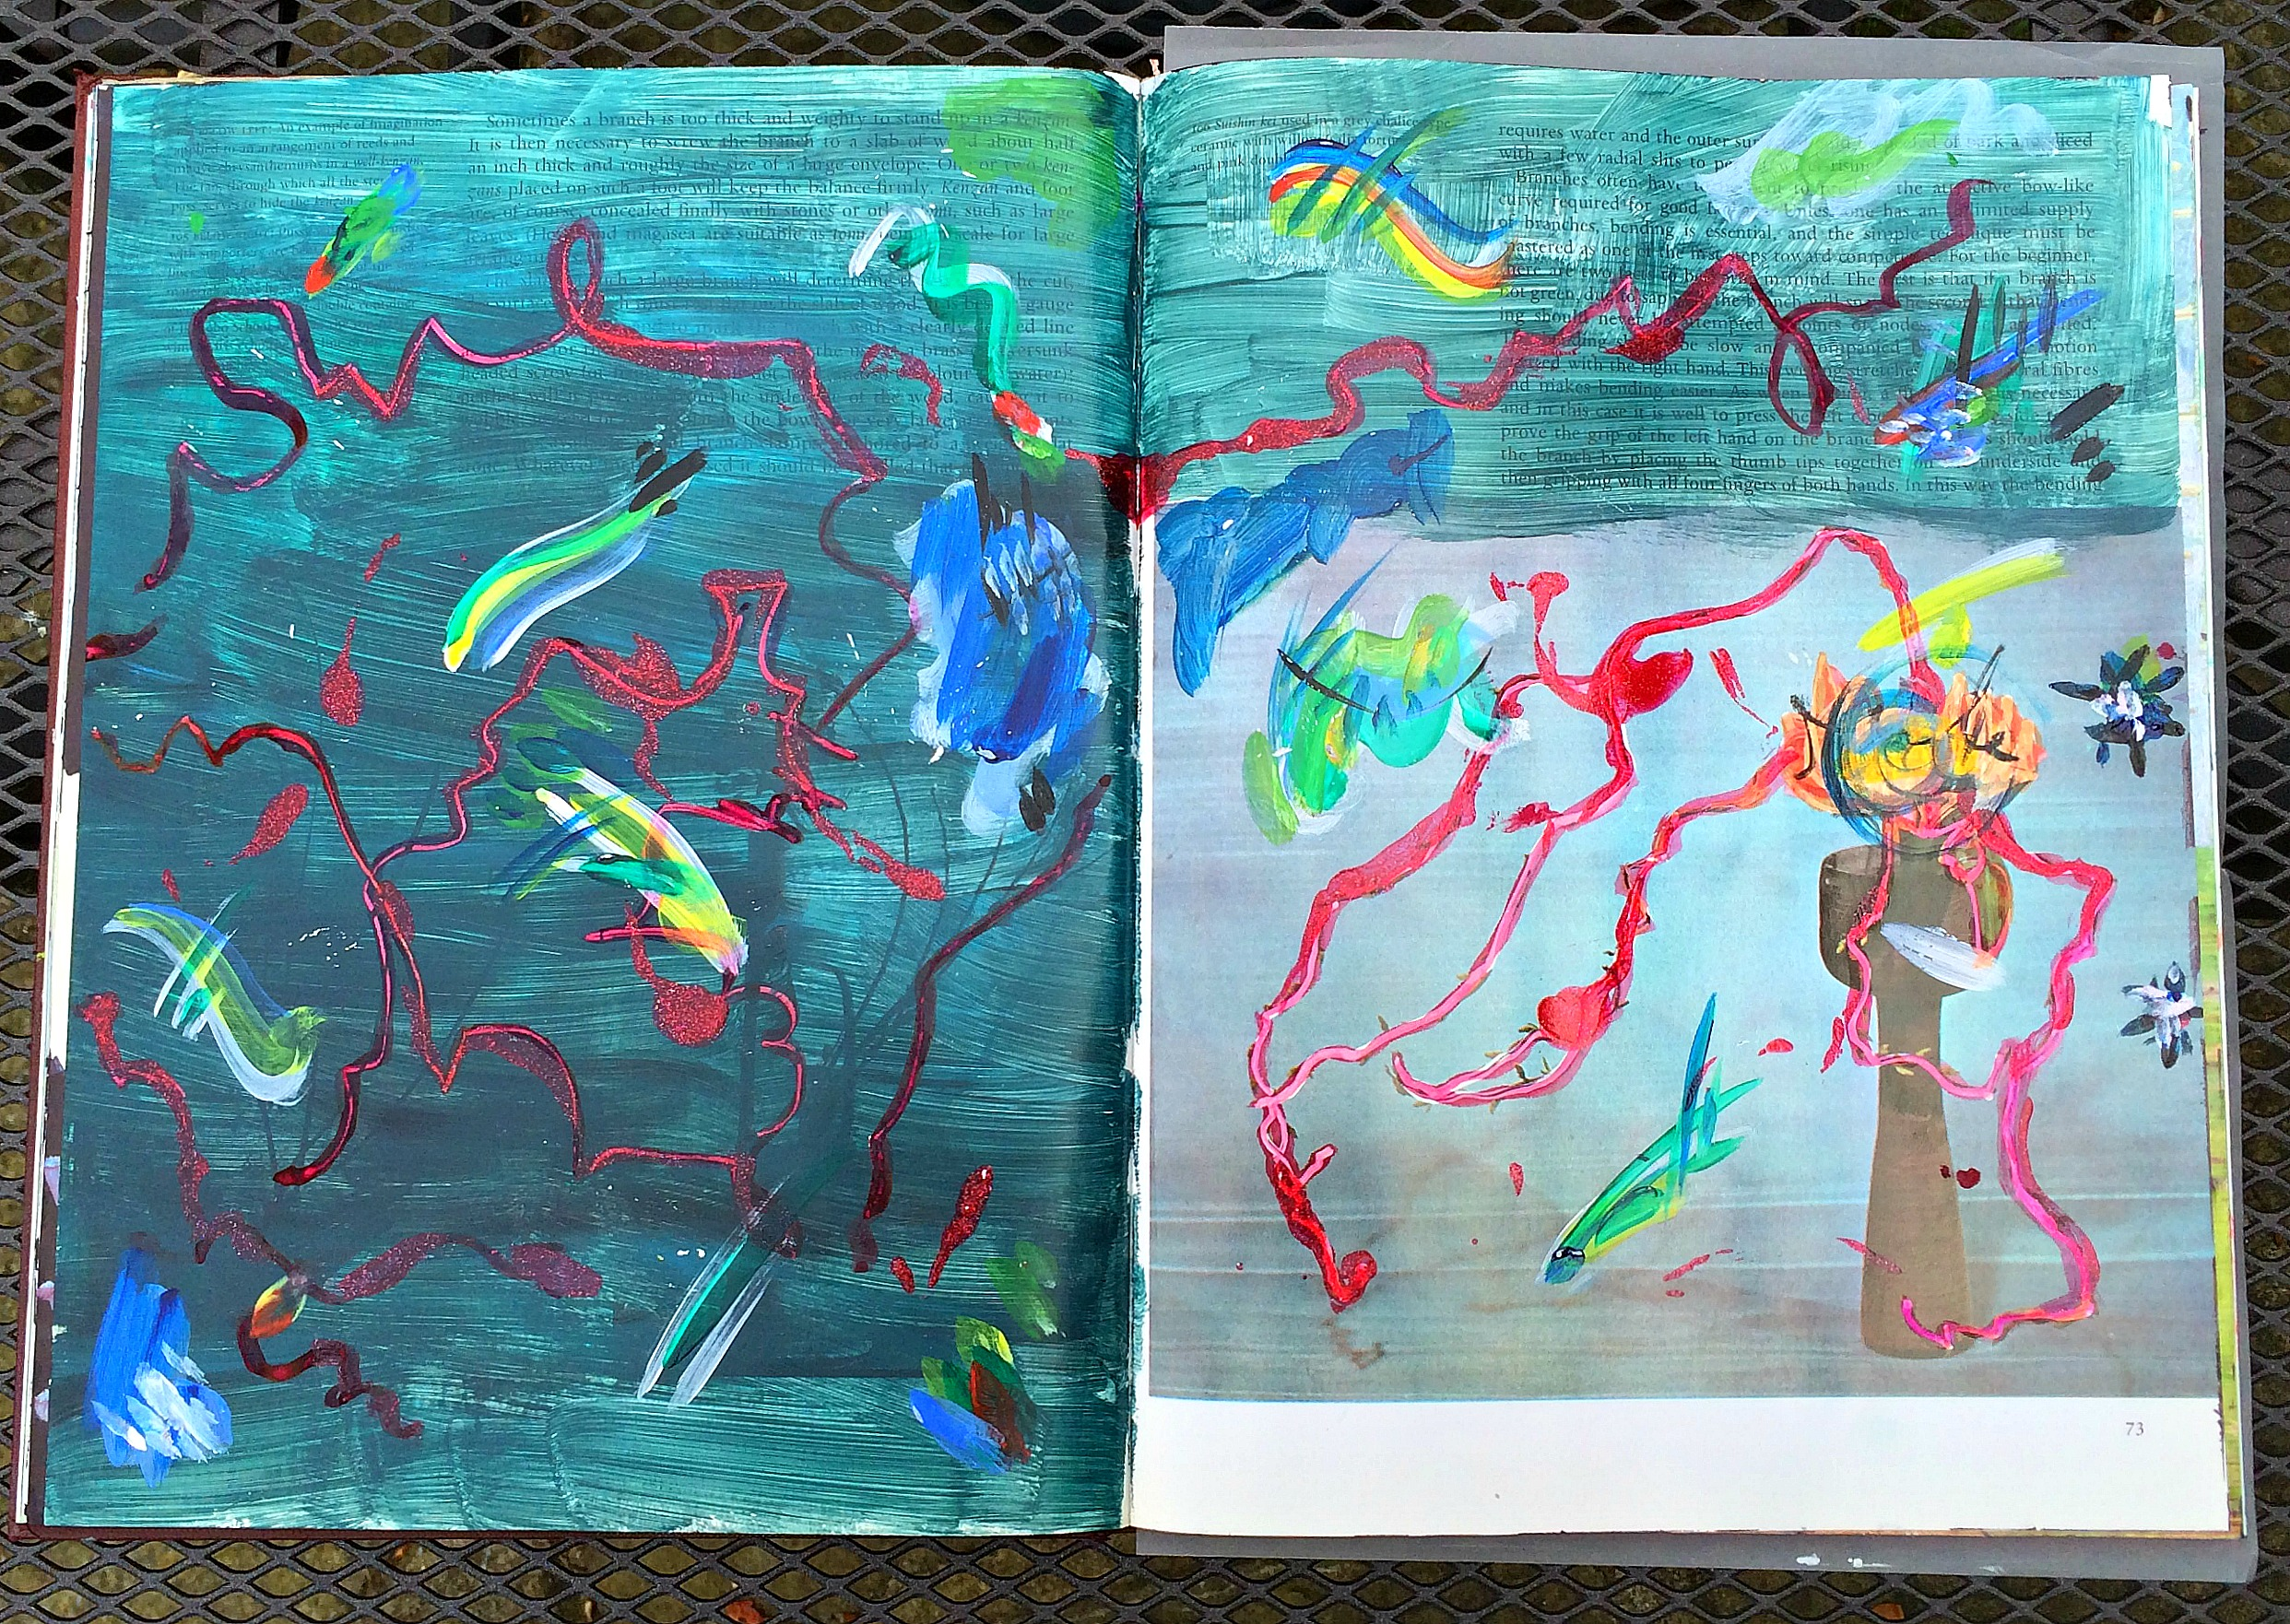 Altered Book (Japanese Flower Arranging): responsive seascape